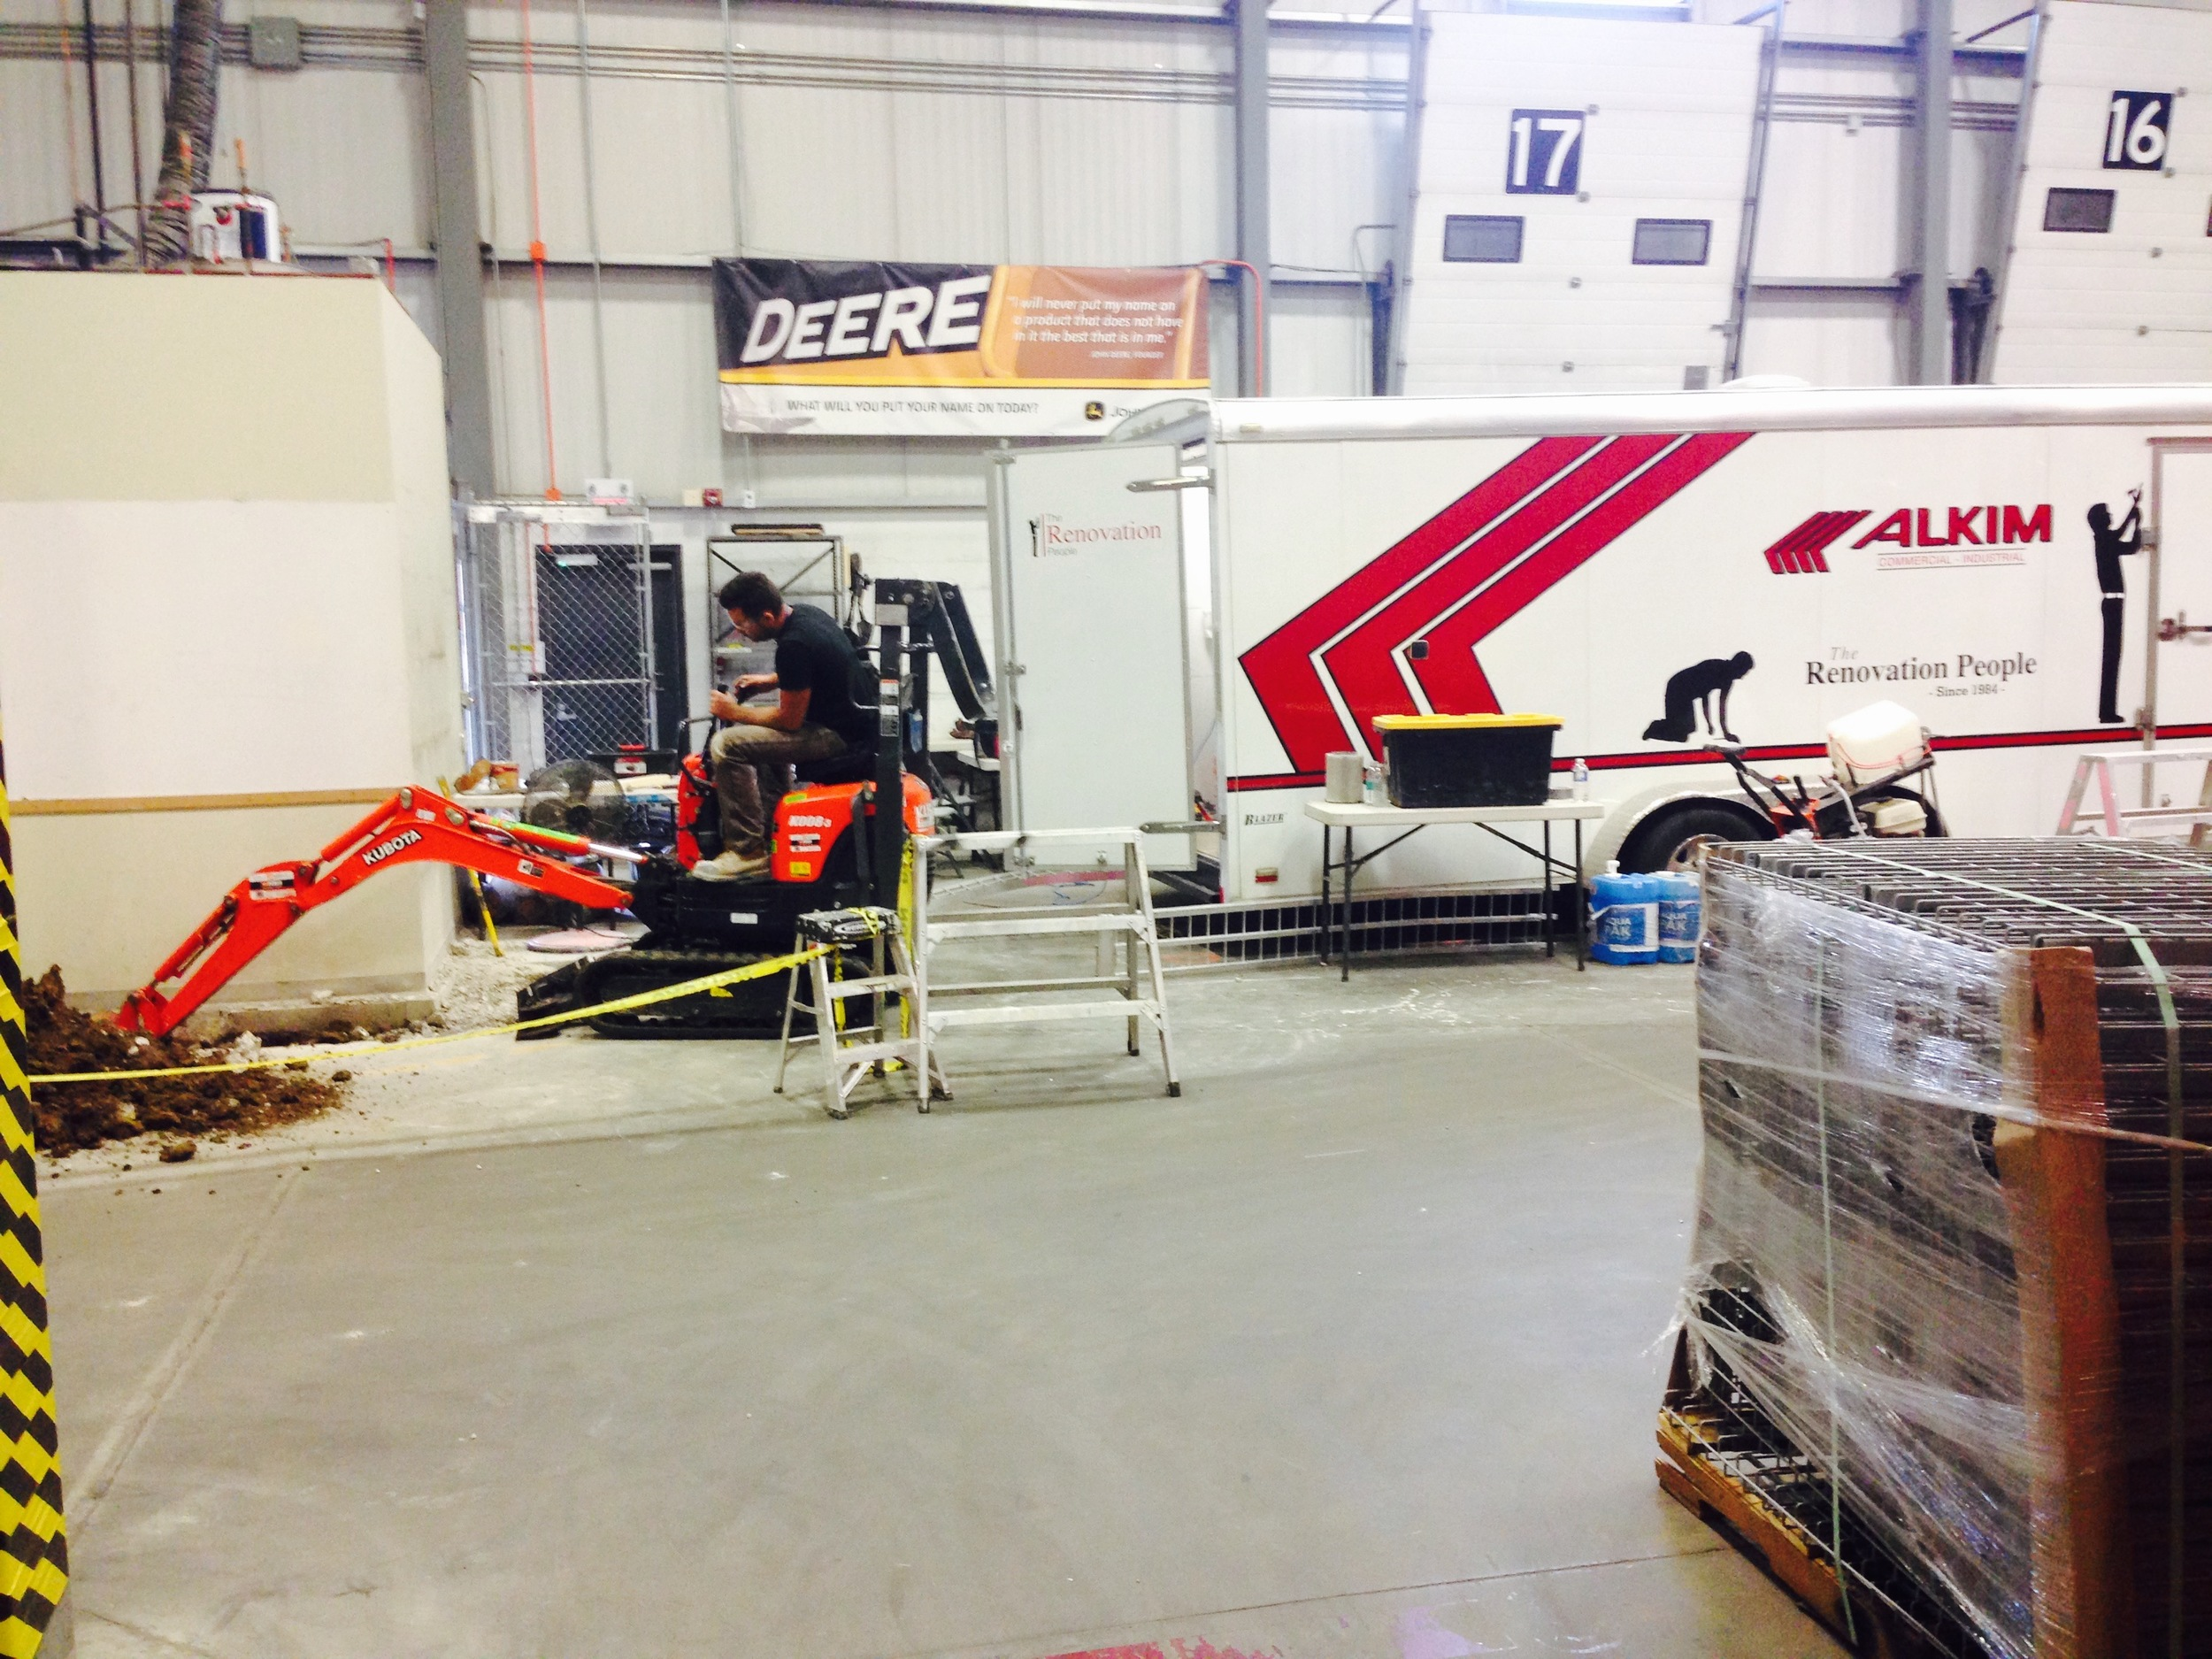 PB04  Plumbing - General Contractors Commercial Renovations in Edmonton, Office and Warehouse Project Contractors